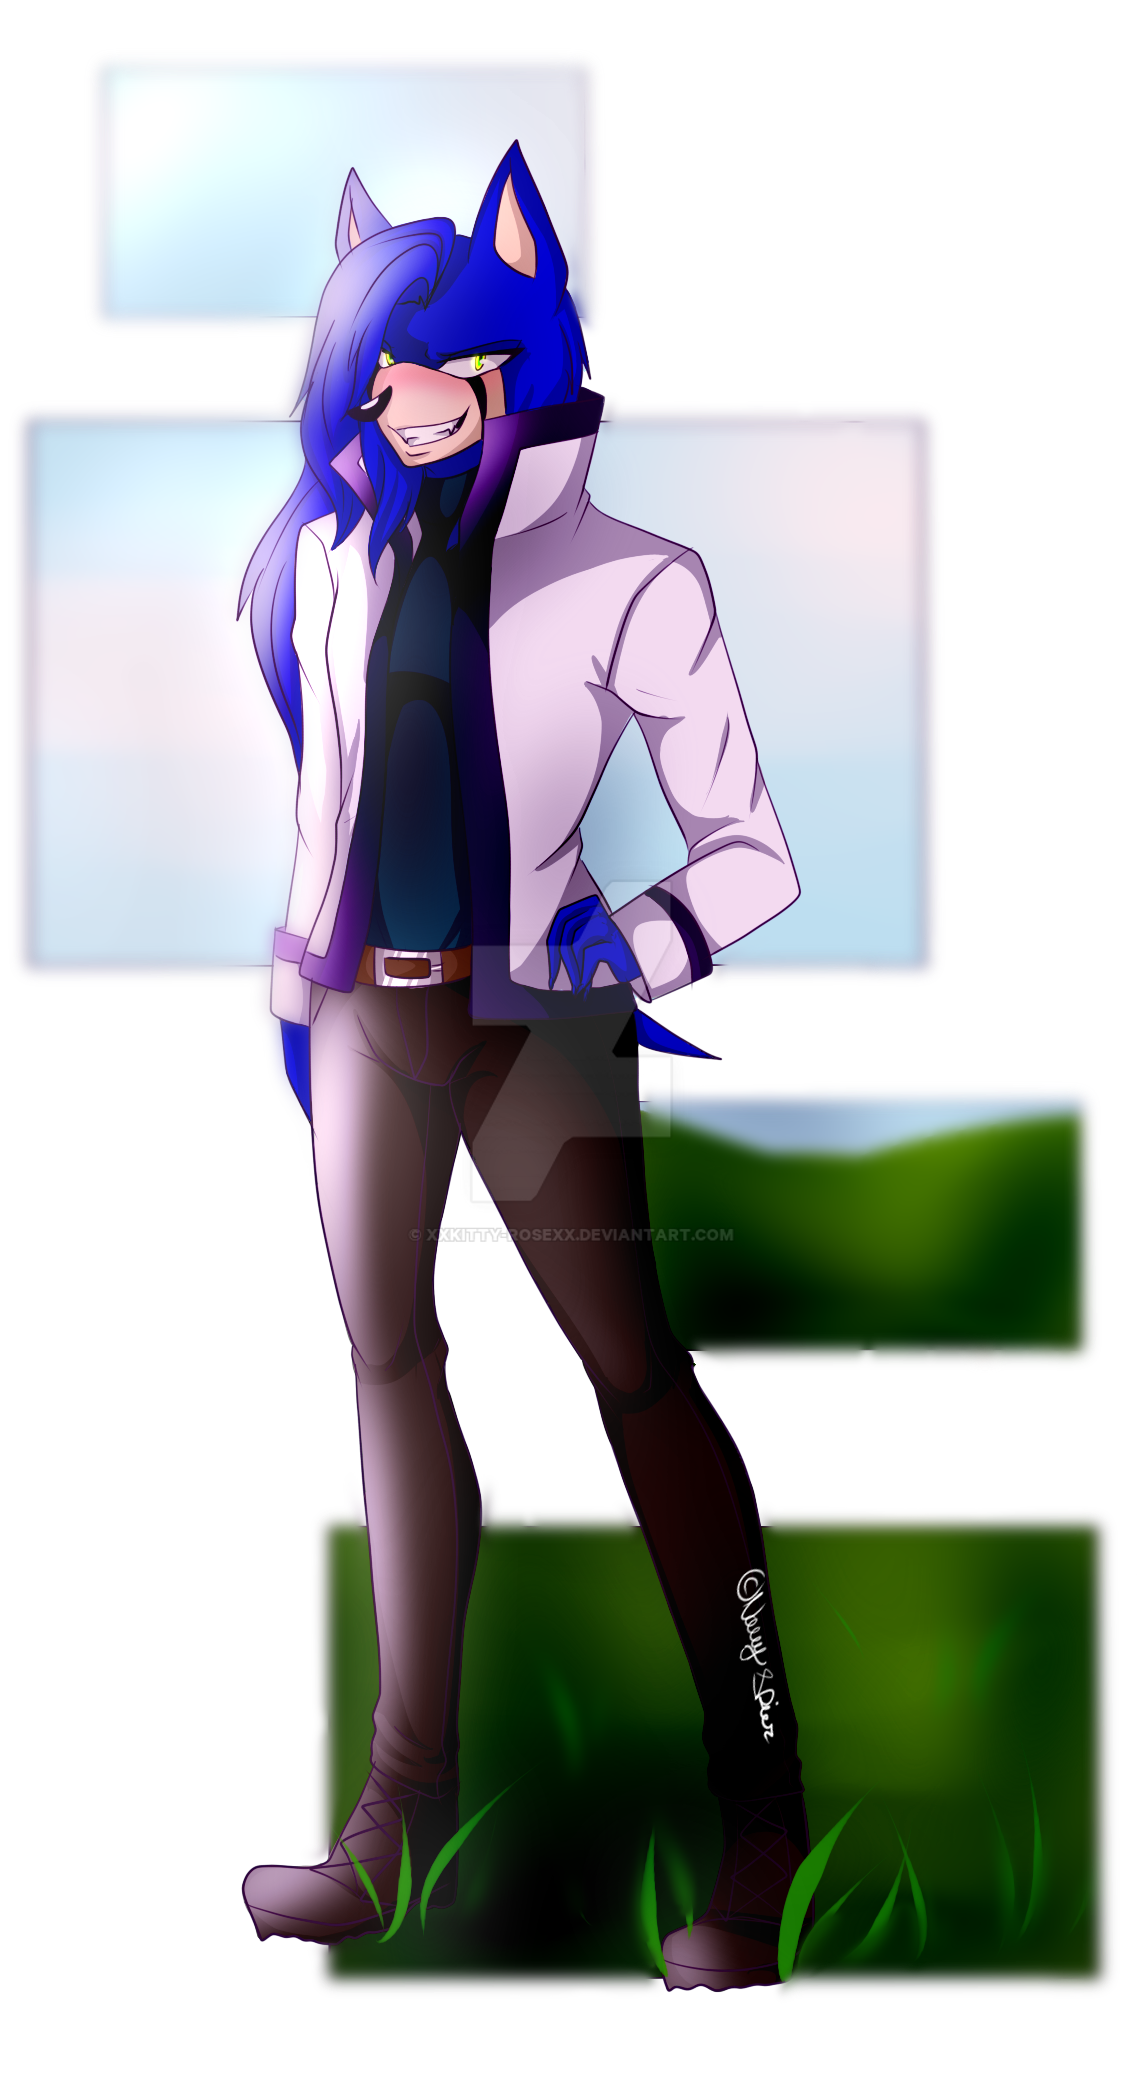 xxkitty-rosexx's Profile Picture